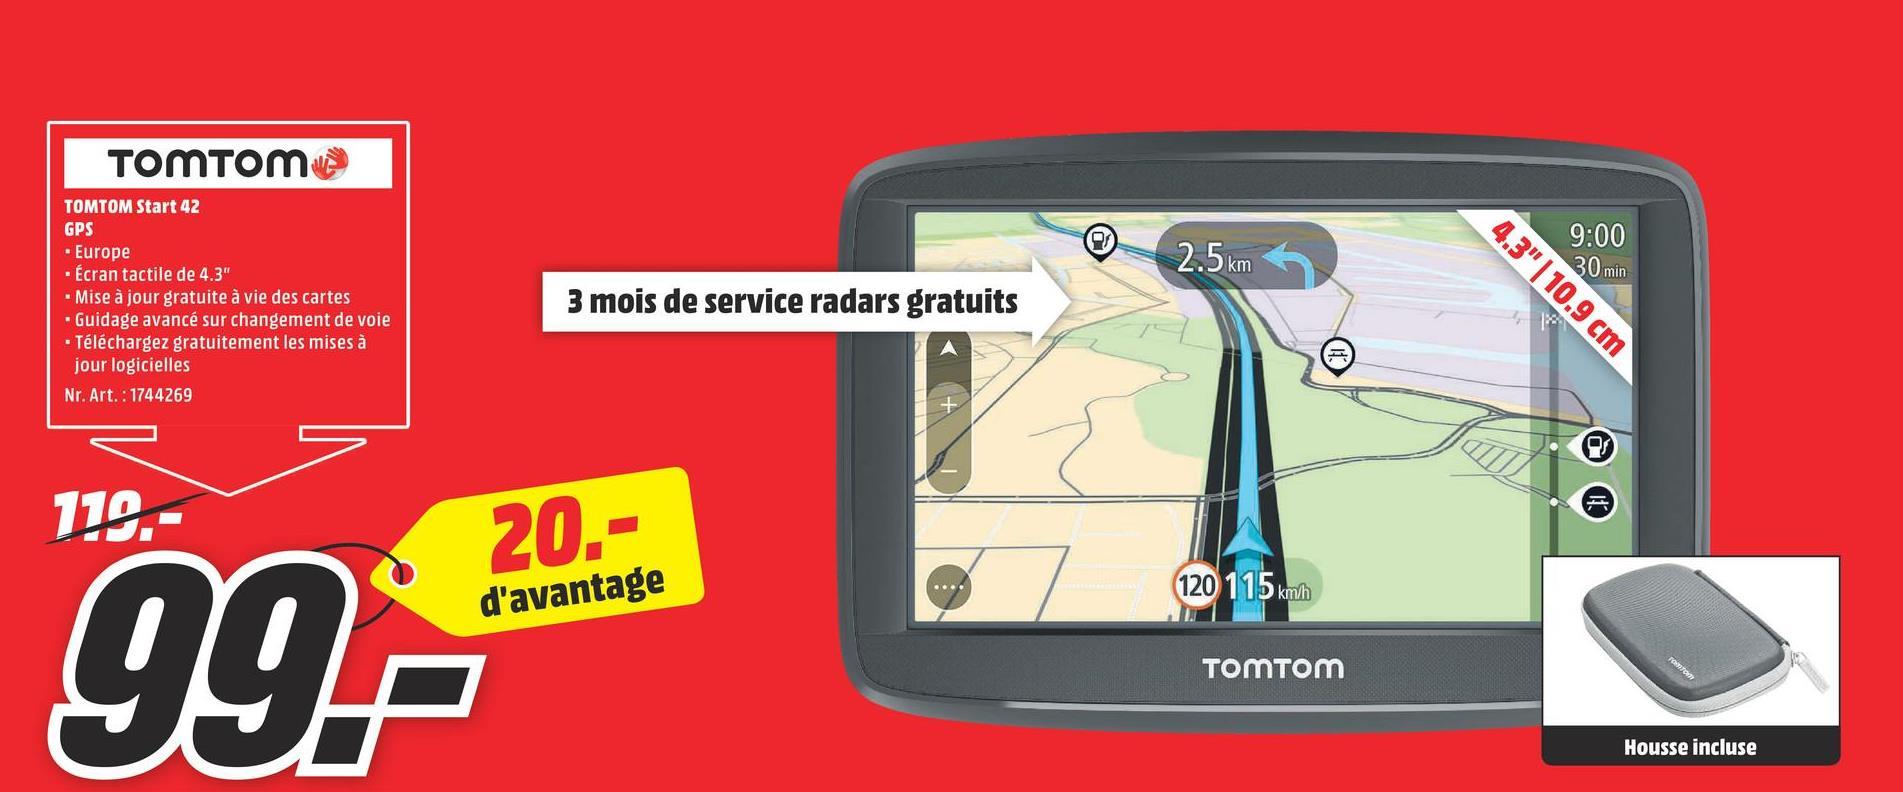 Folder MediaMarkt du 16/07/2018 au 22/07/2018 - TOMTOM Start 42 GPS voiture Europe de l'Ouest (1AA4.054.00) 1AA4.054.00 START 42 WESTERN EUROPE 23 COUNTRIES